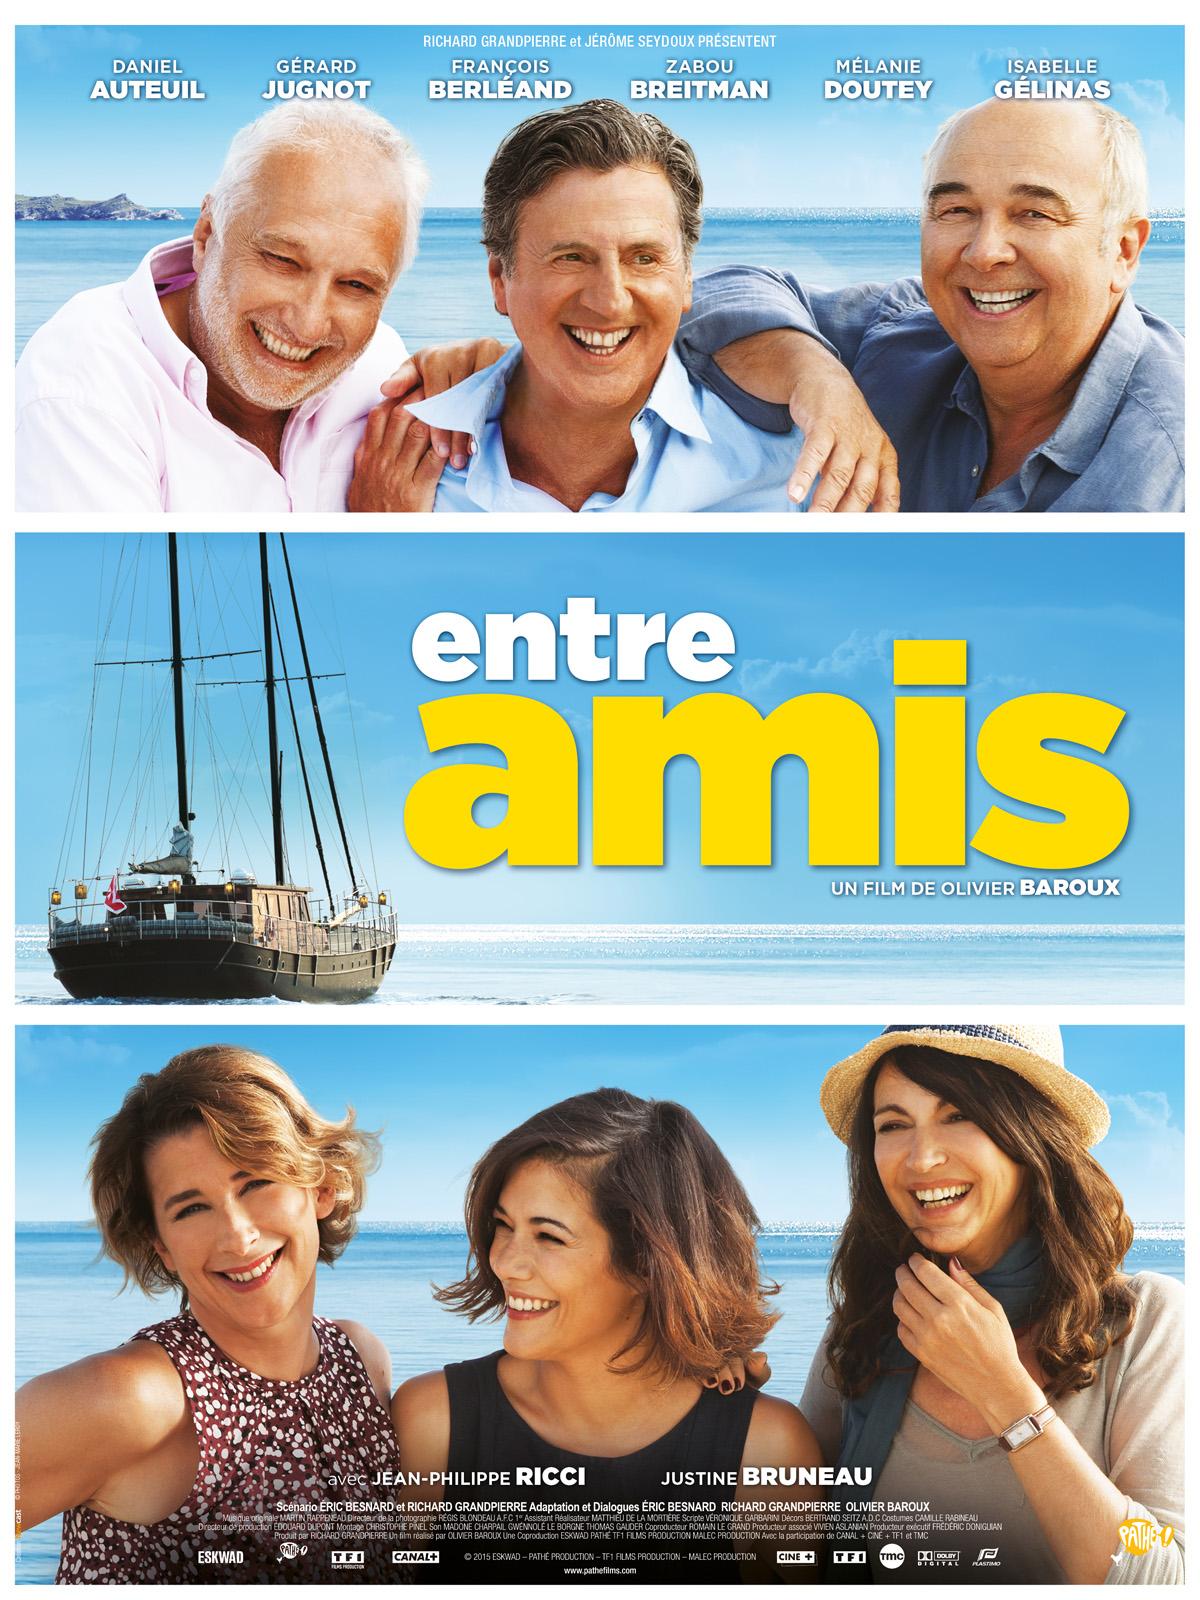 cd8a1f61a7e15 Entre amis (2015) - IMDb